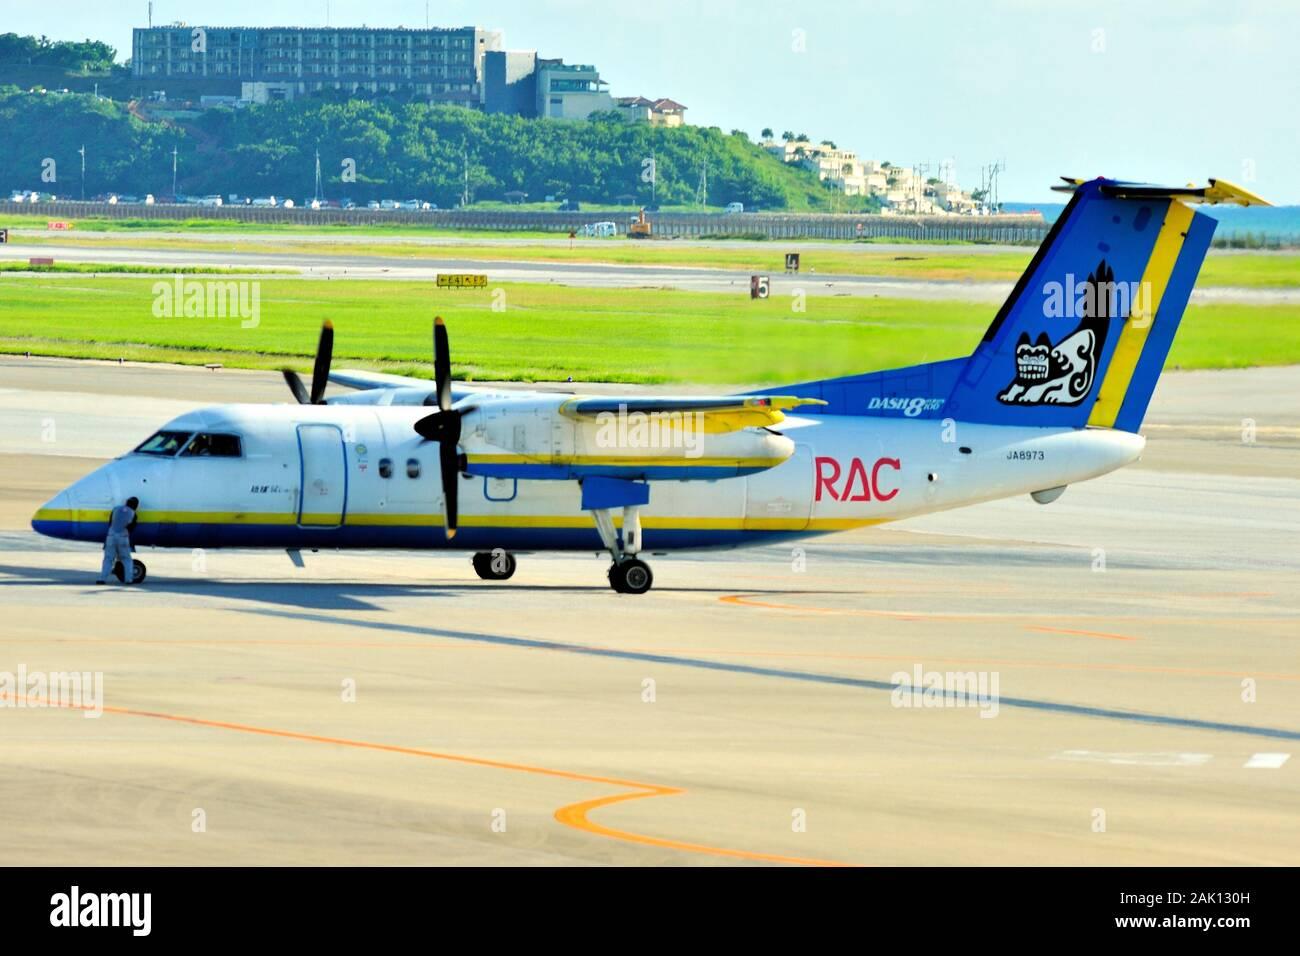 Ryukyu Air Commuter, RAC, De Havilland Canada Dash 8, DHC-8-100, JA8973, Getting Ready For Departure, Naha Airport, Okinawa, Japan Stock Photo